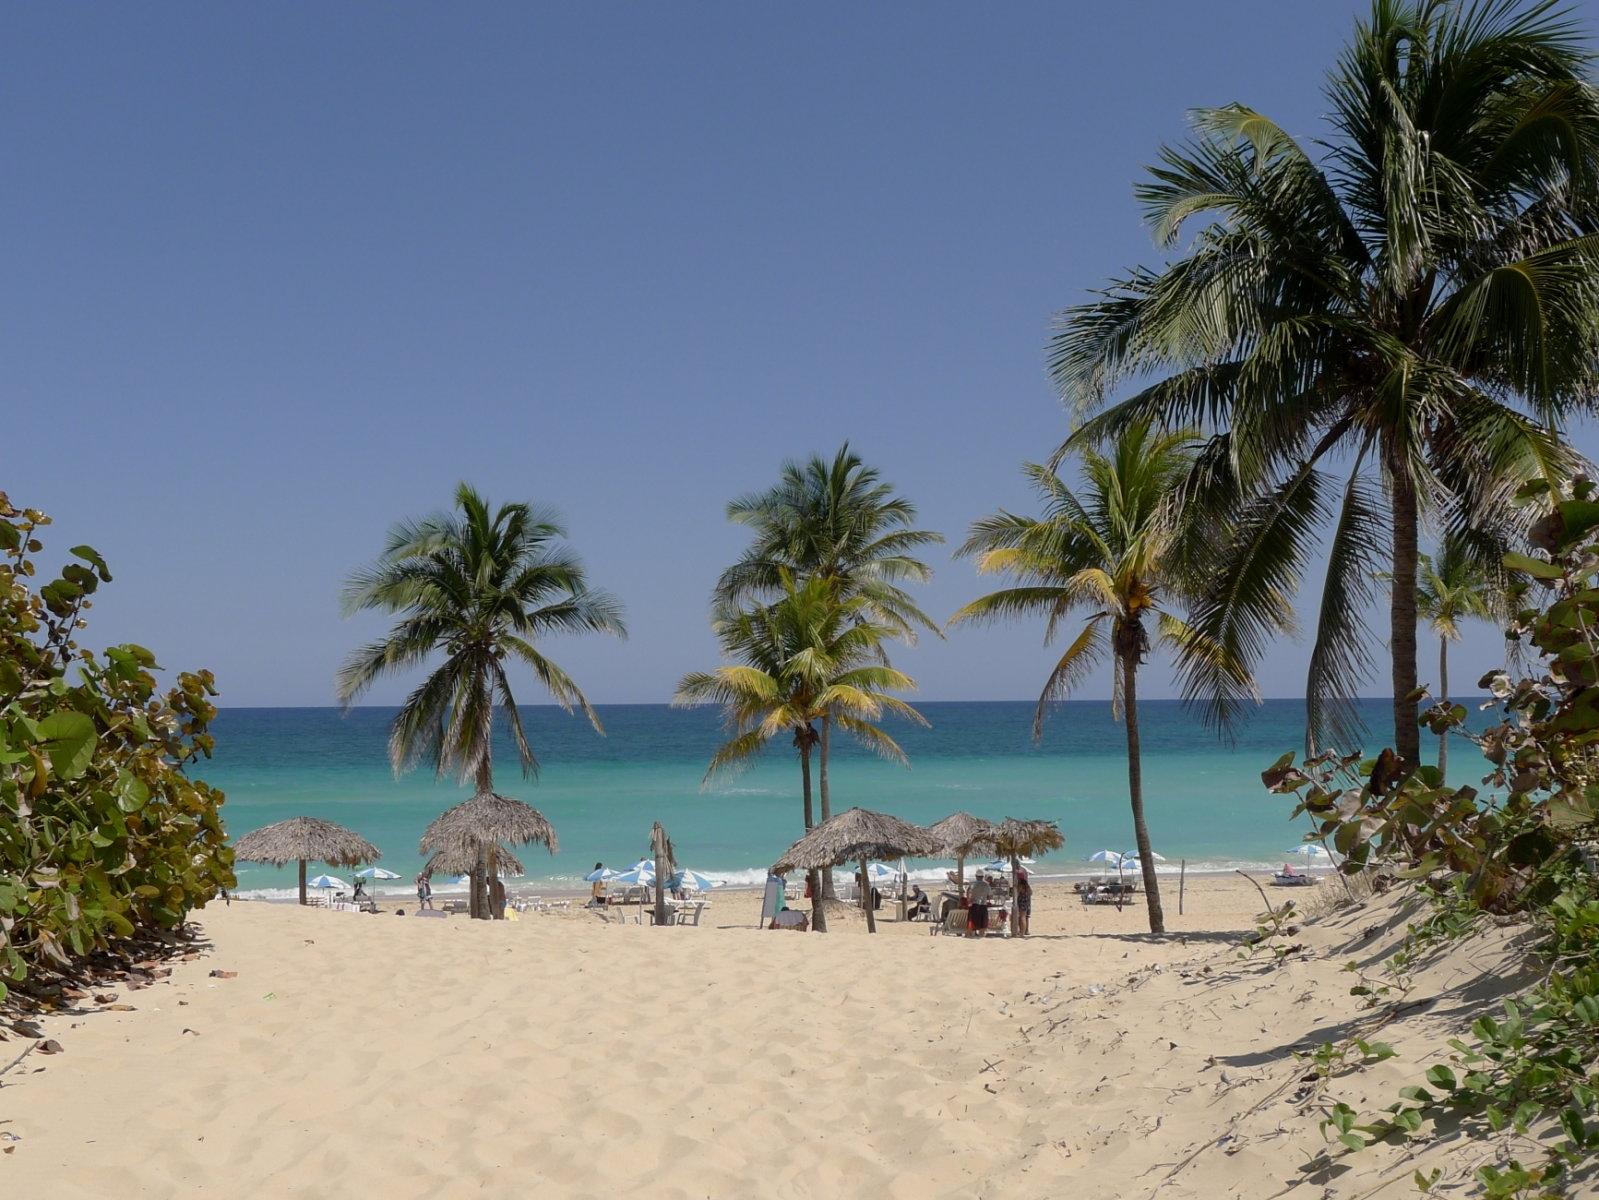 Dünengürtel, Sandstrand, Palmen, Meer